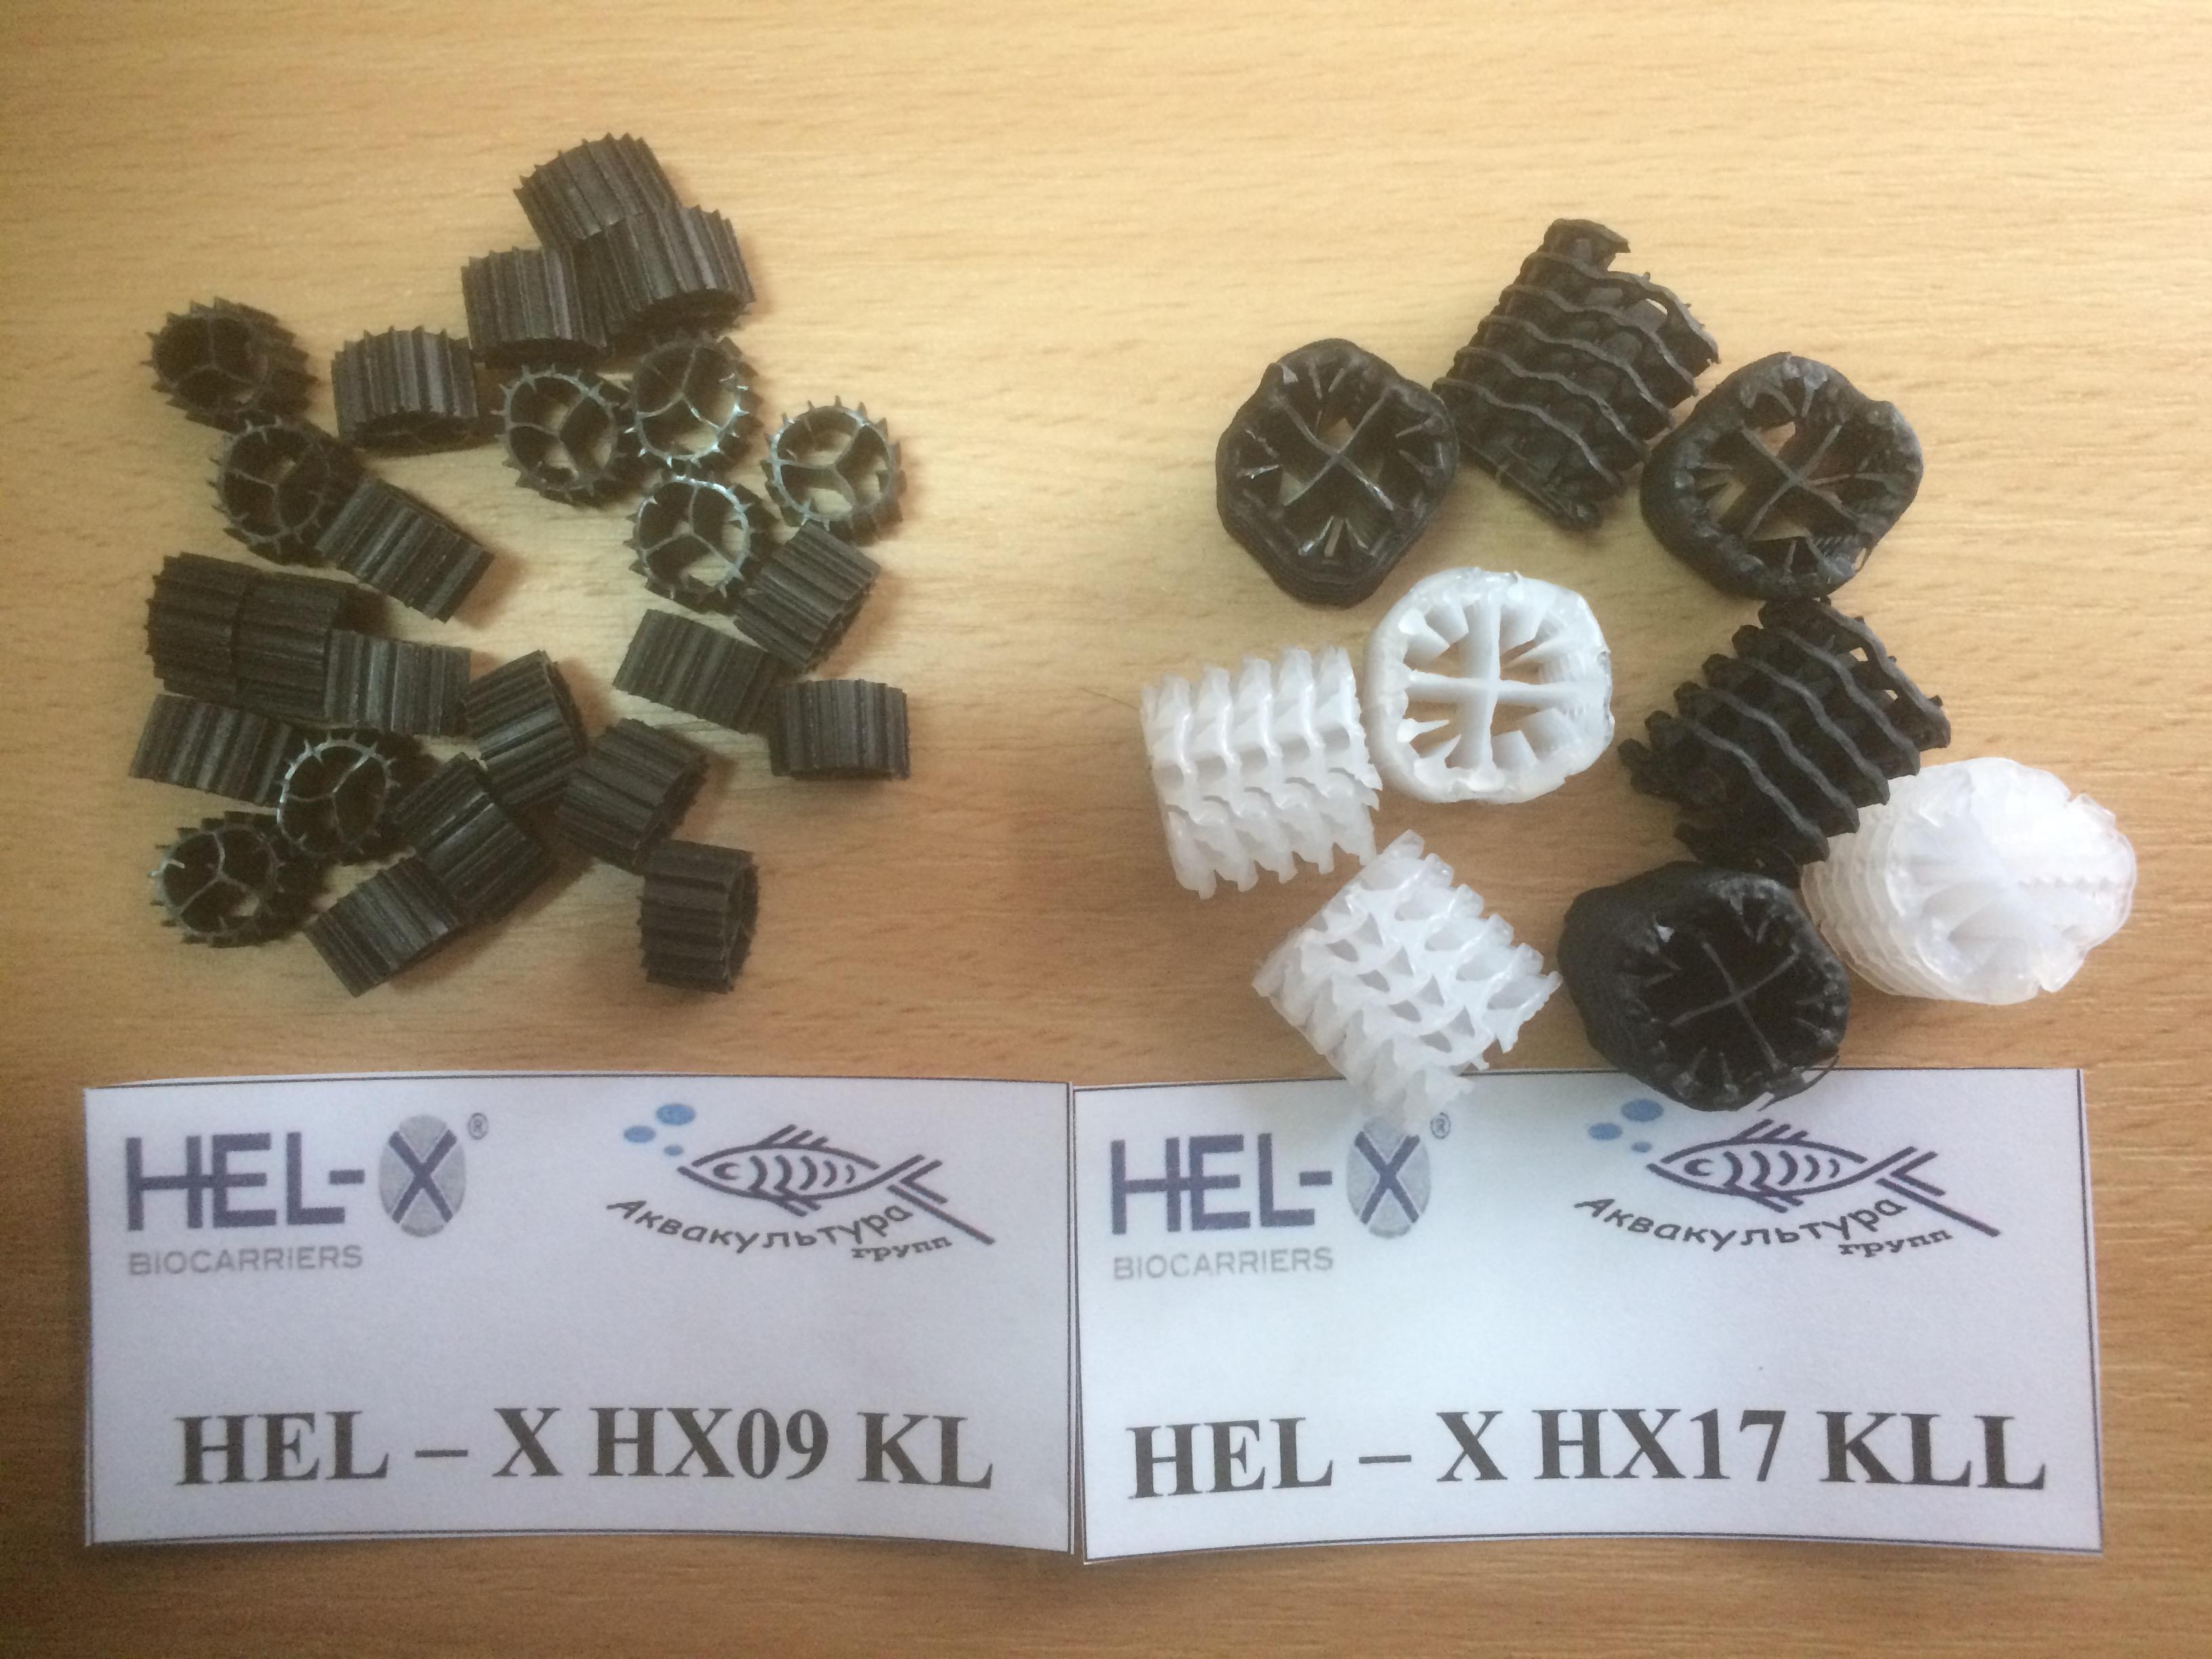 Биозагрузка Hel-X